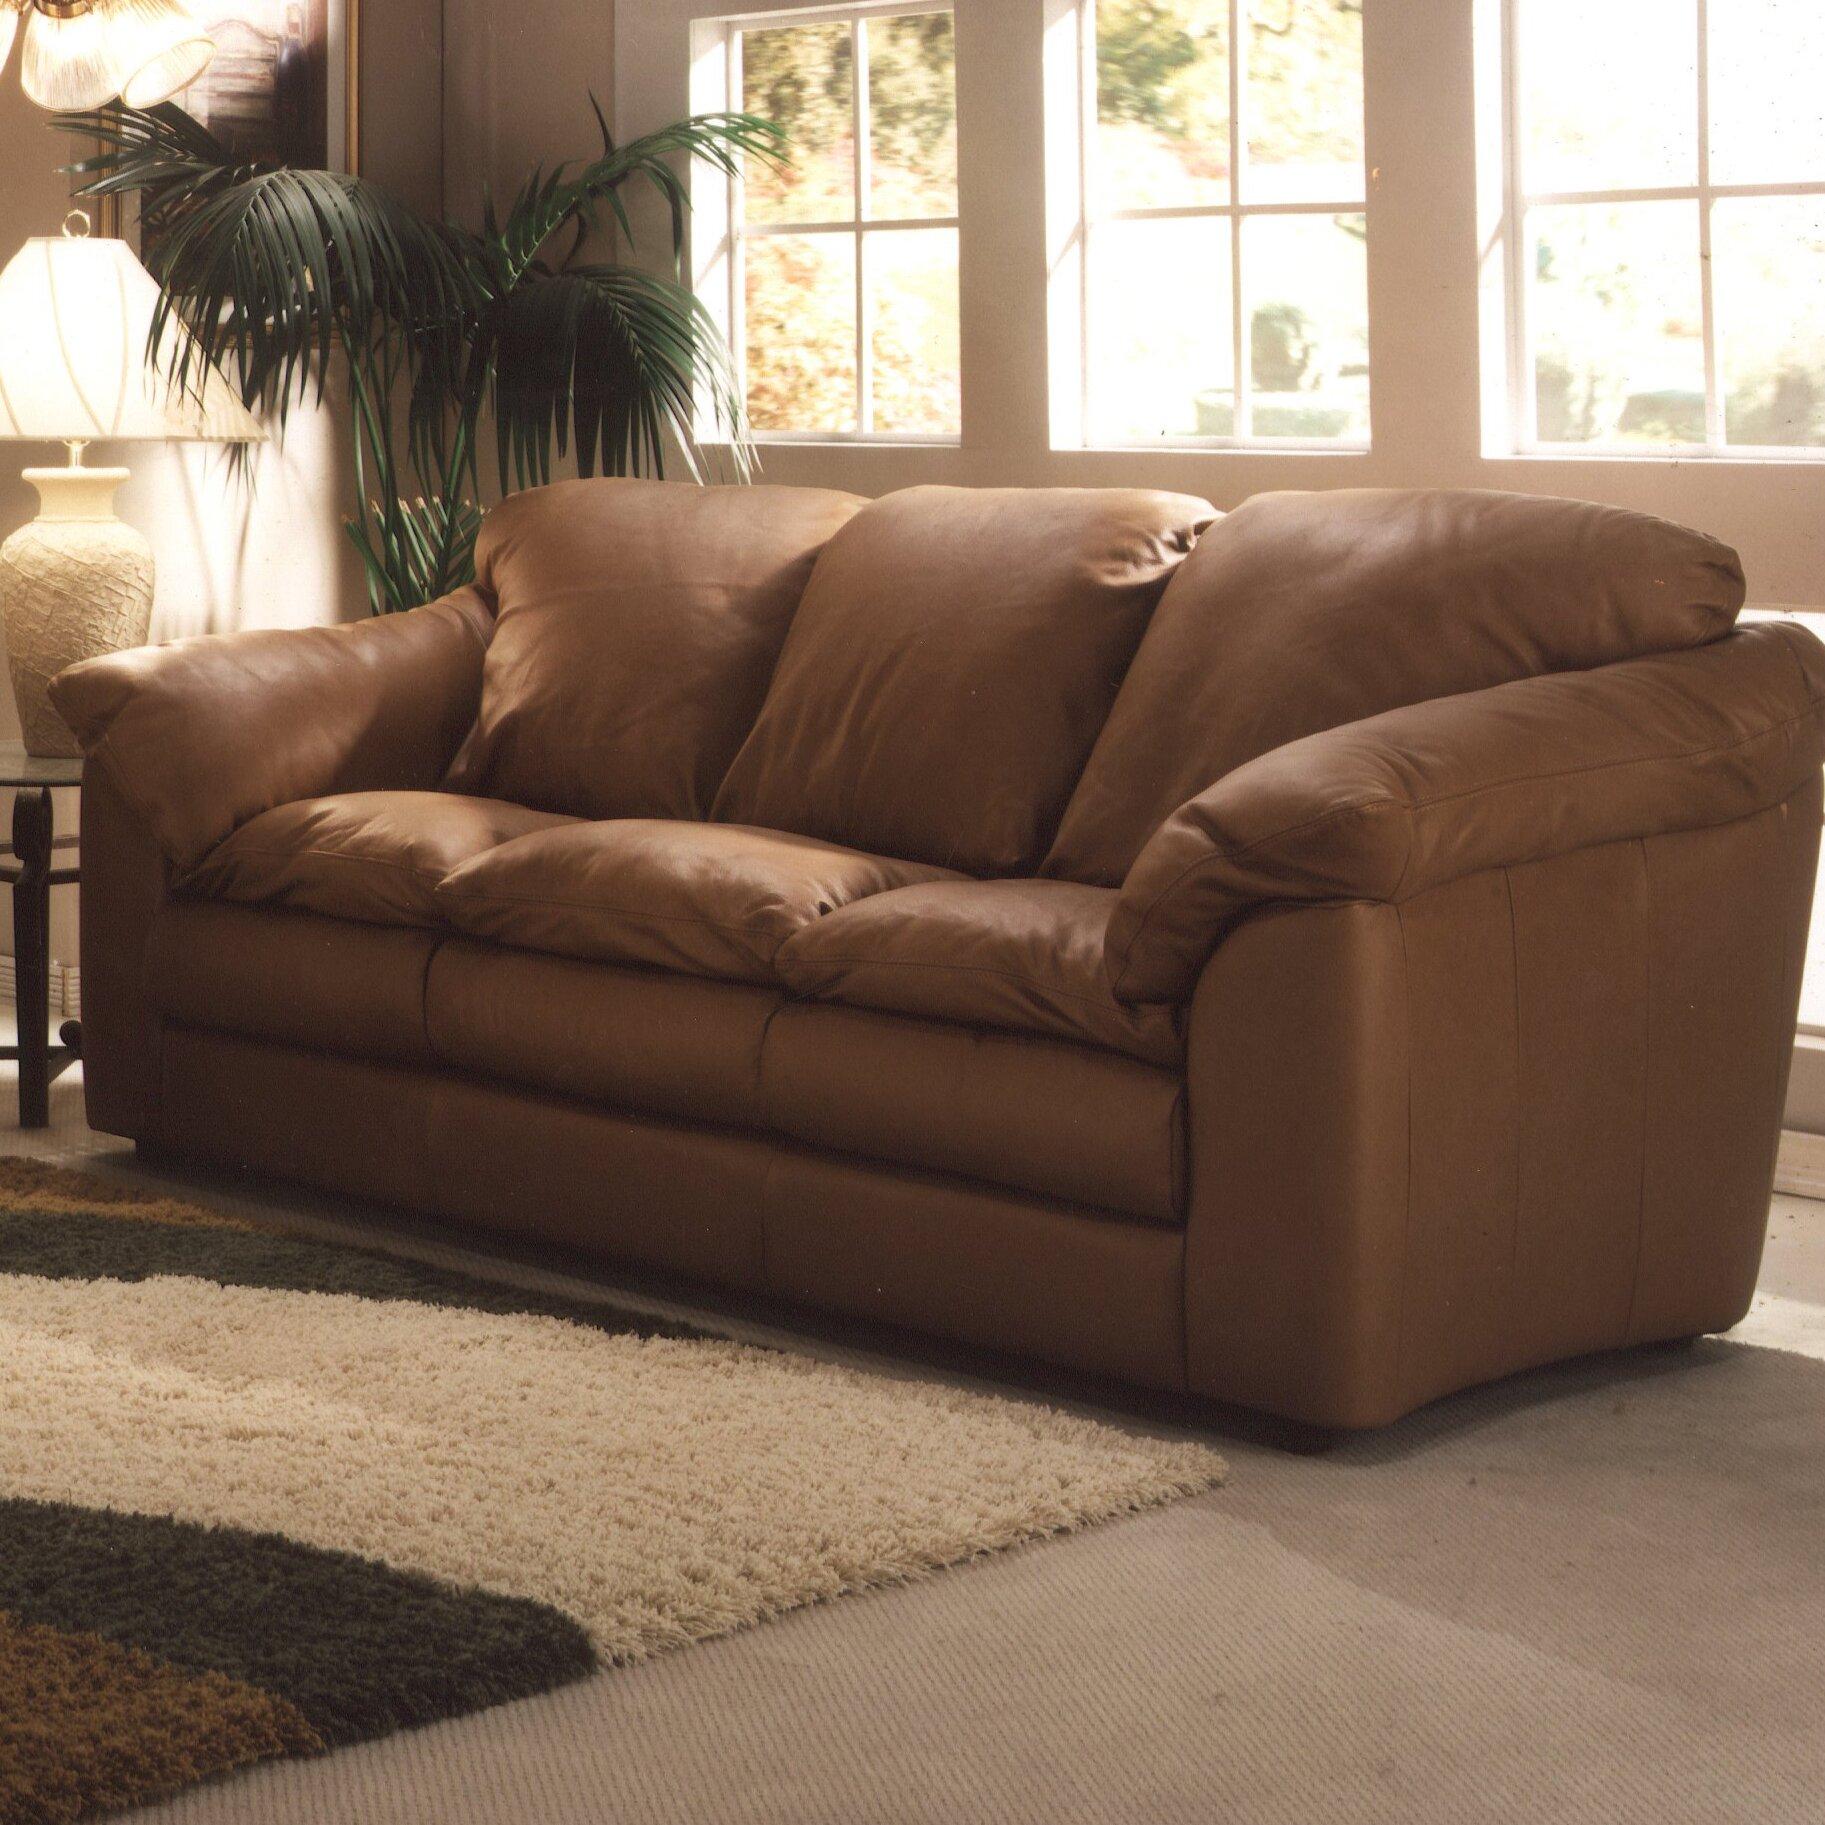 Omnia Leather Oregon Leather Sofa Reviews Wayfair